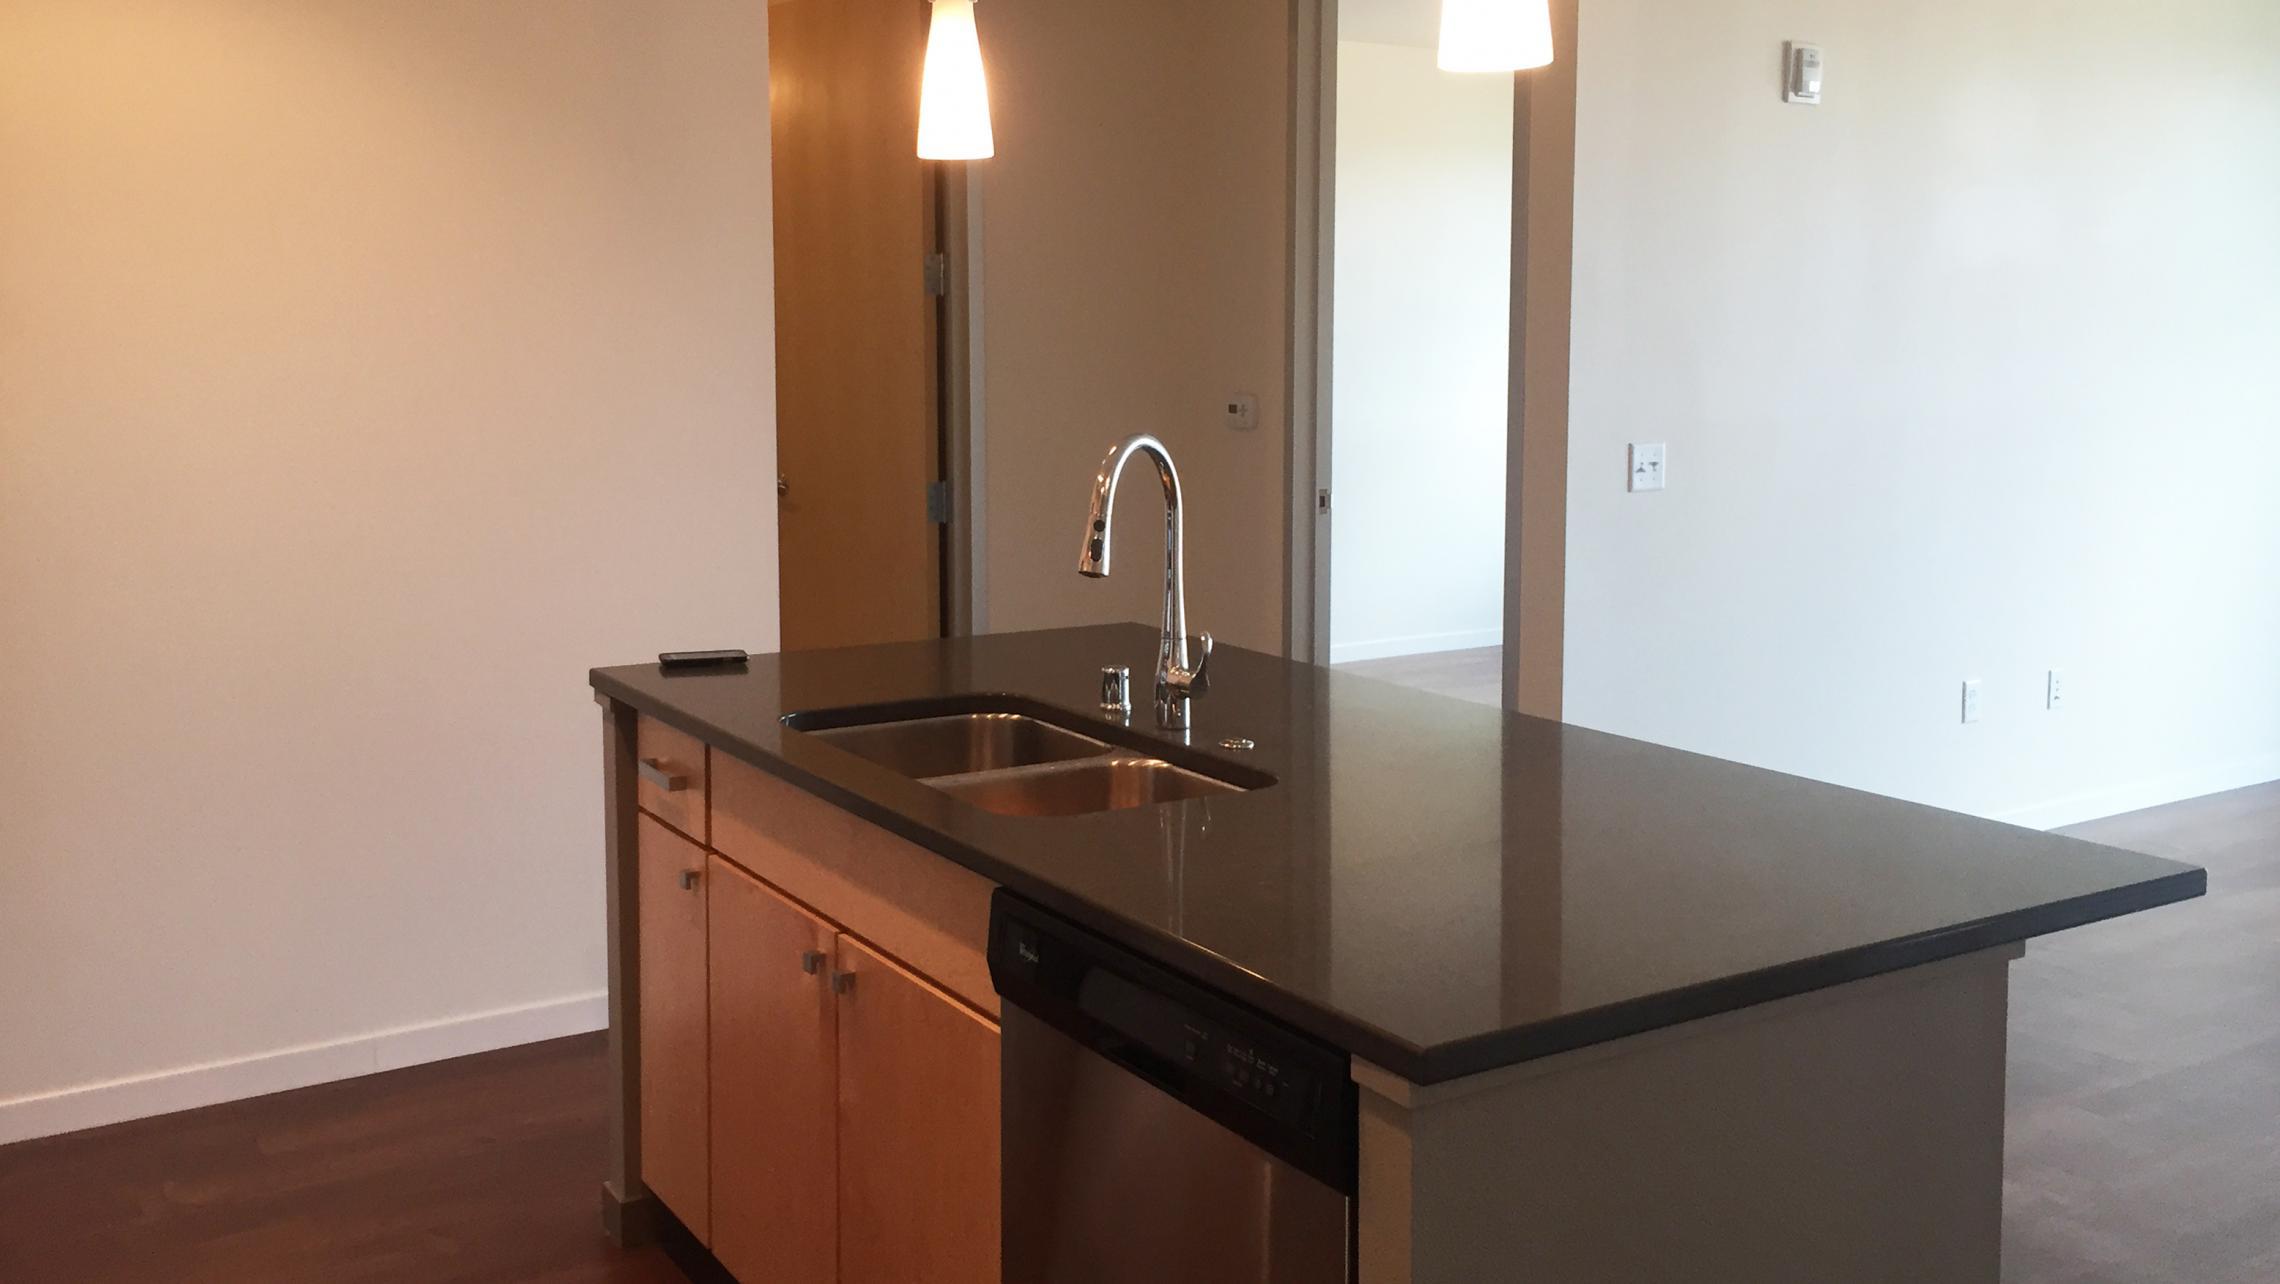 ULI Nine Line Apartment 218 - Kitchen Island